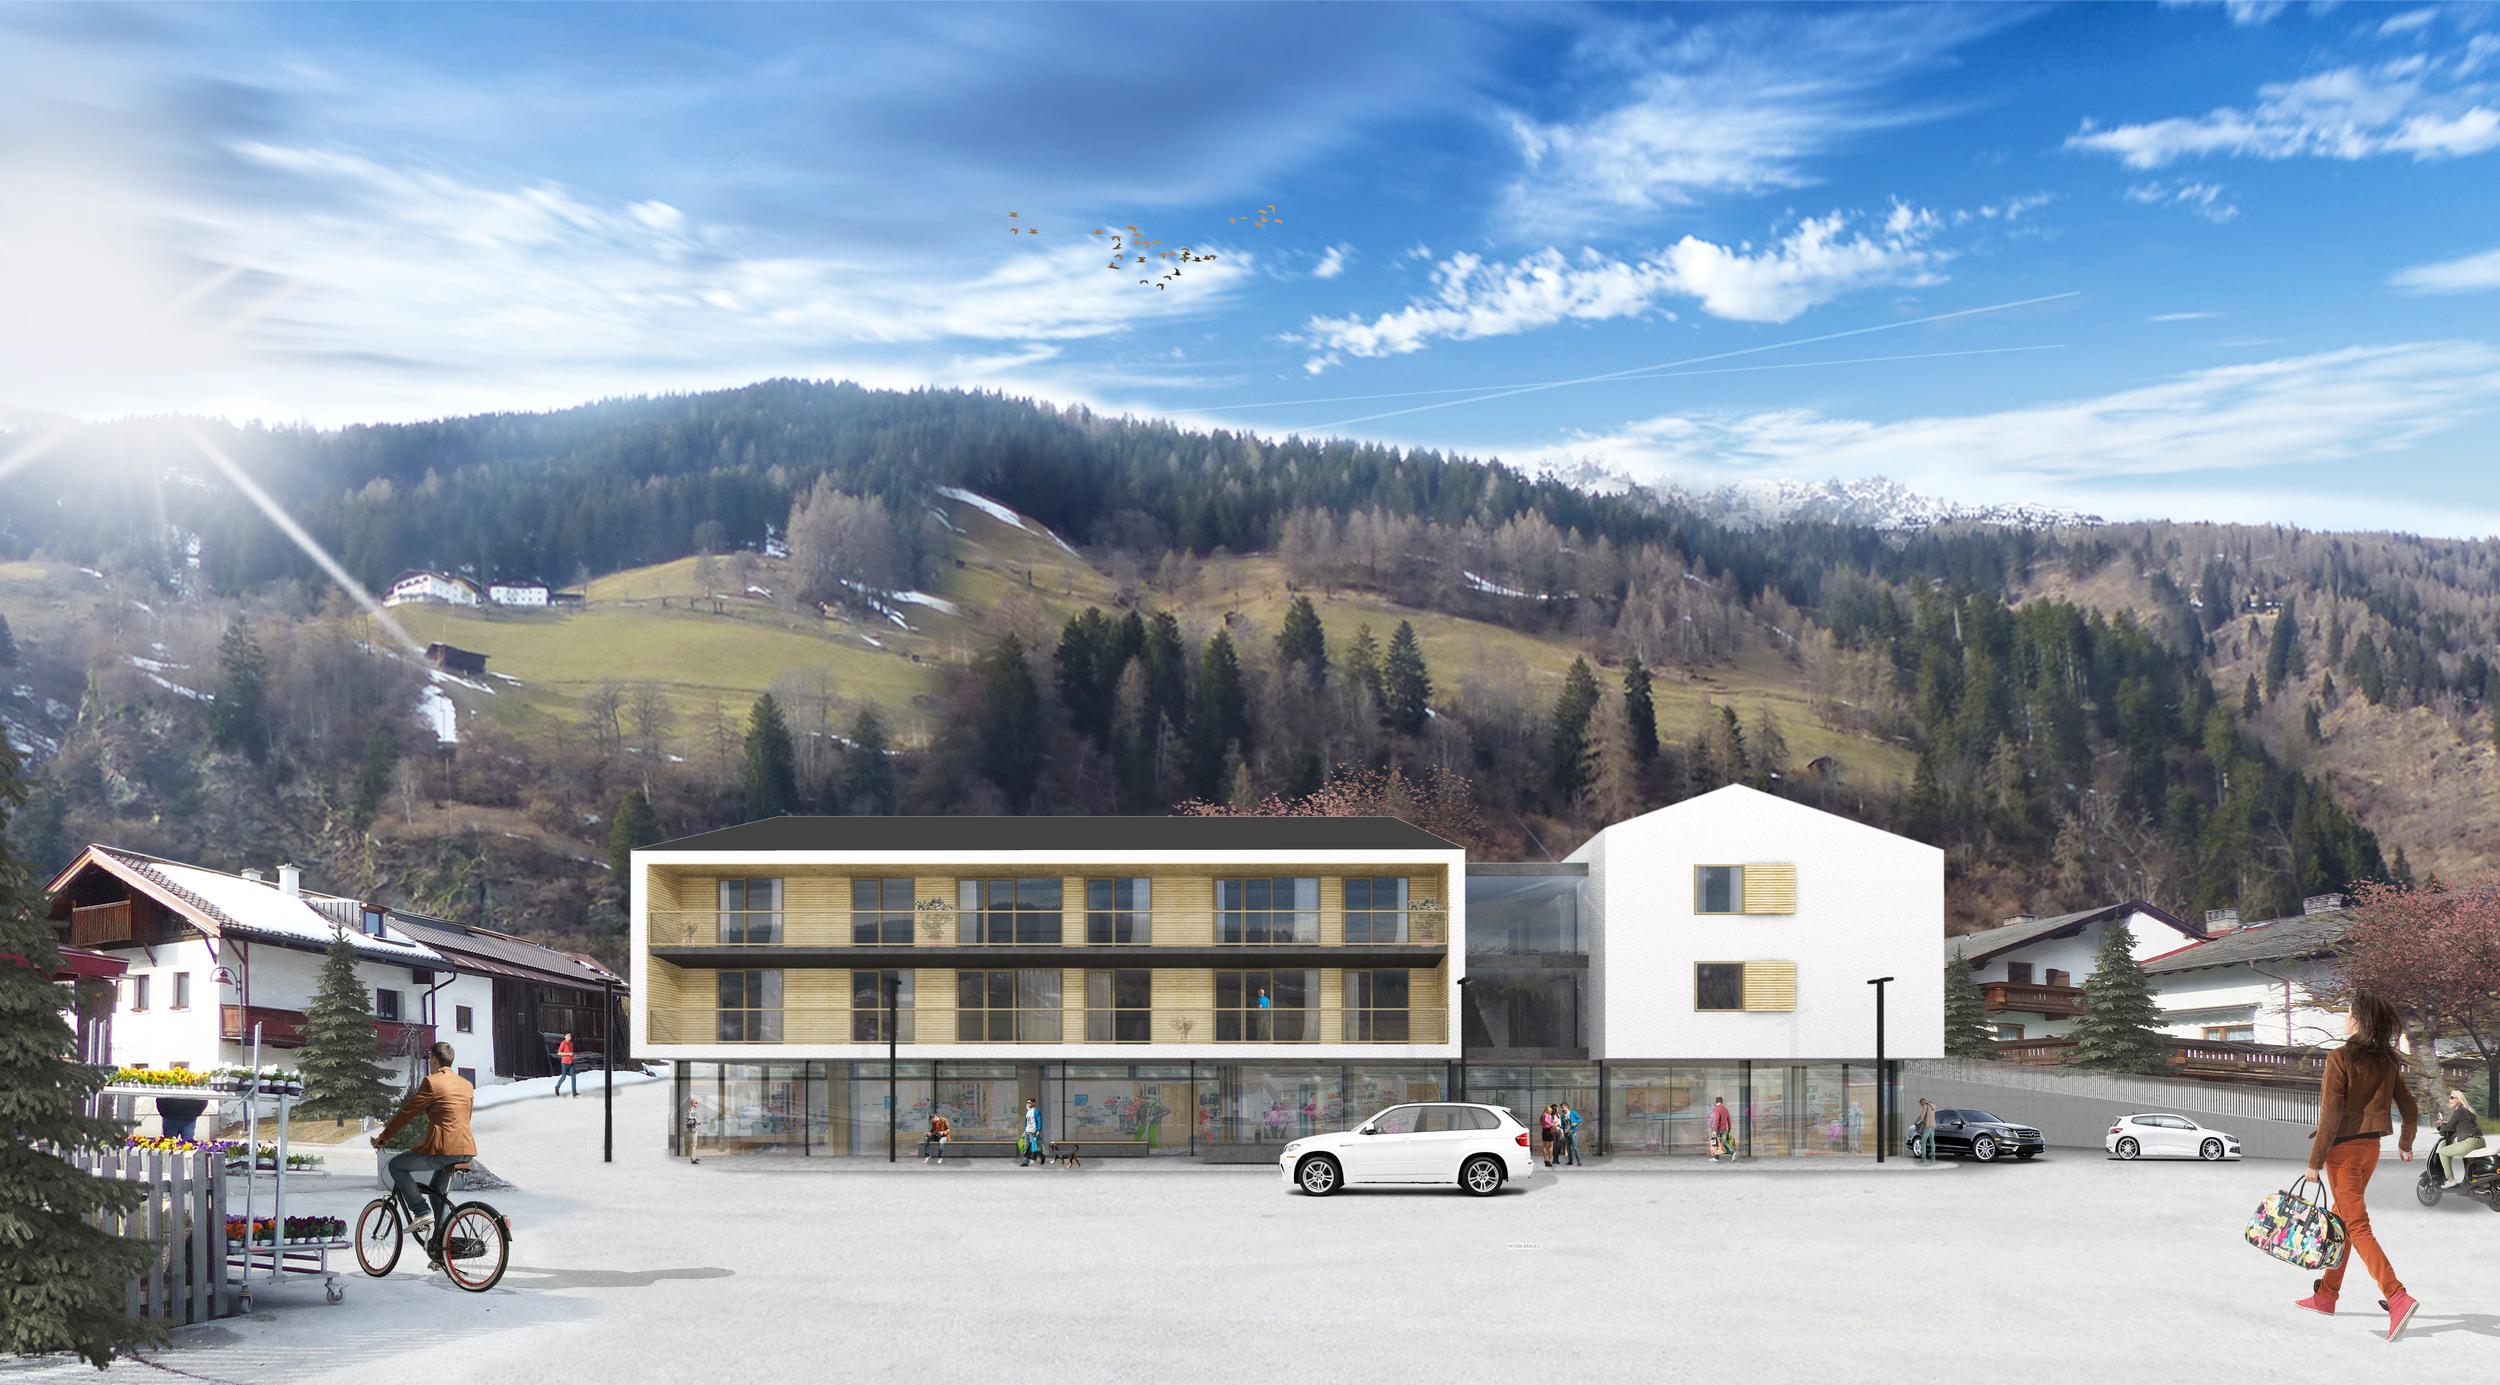 Projekt Neue Heimat tirol